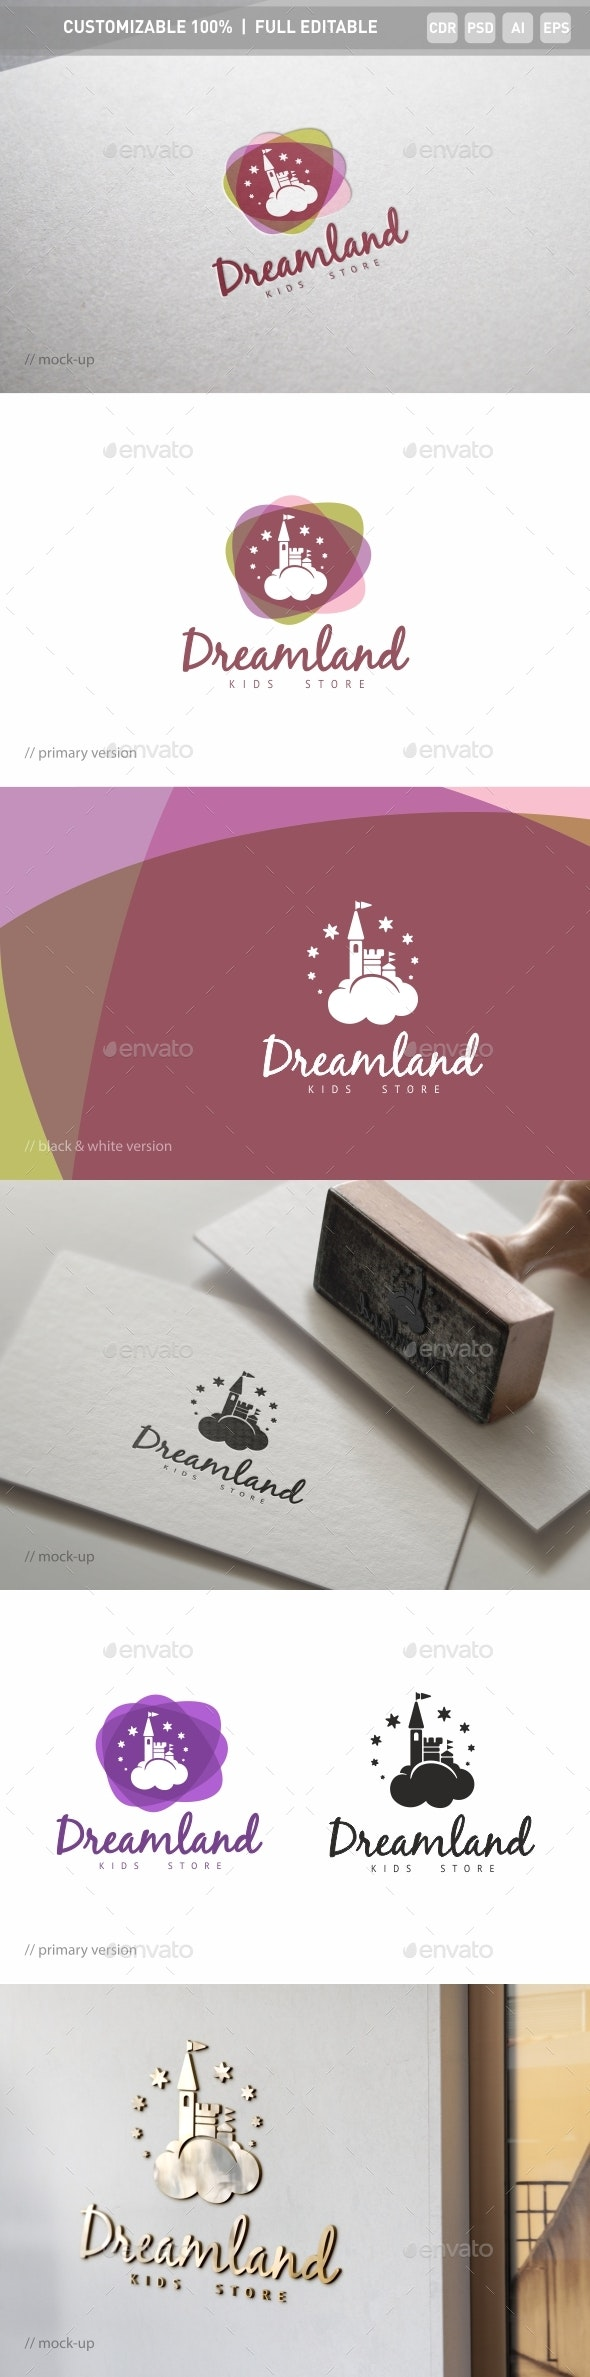 Fairyland Logo Template - Objects Logo Templates